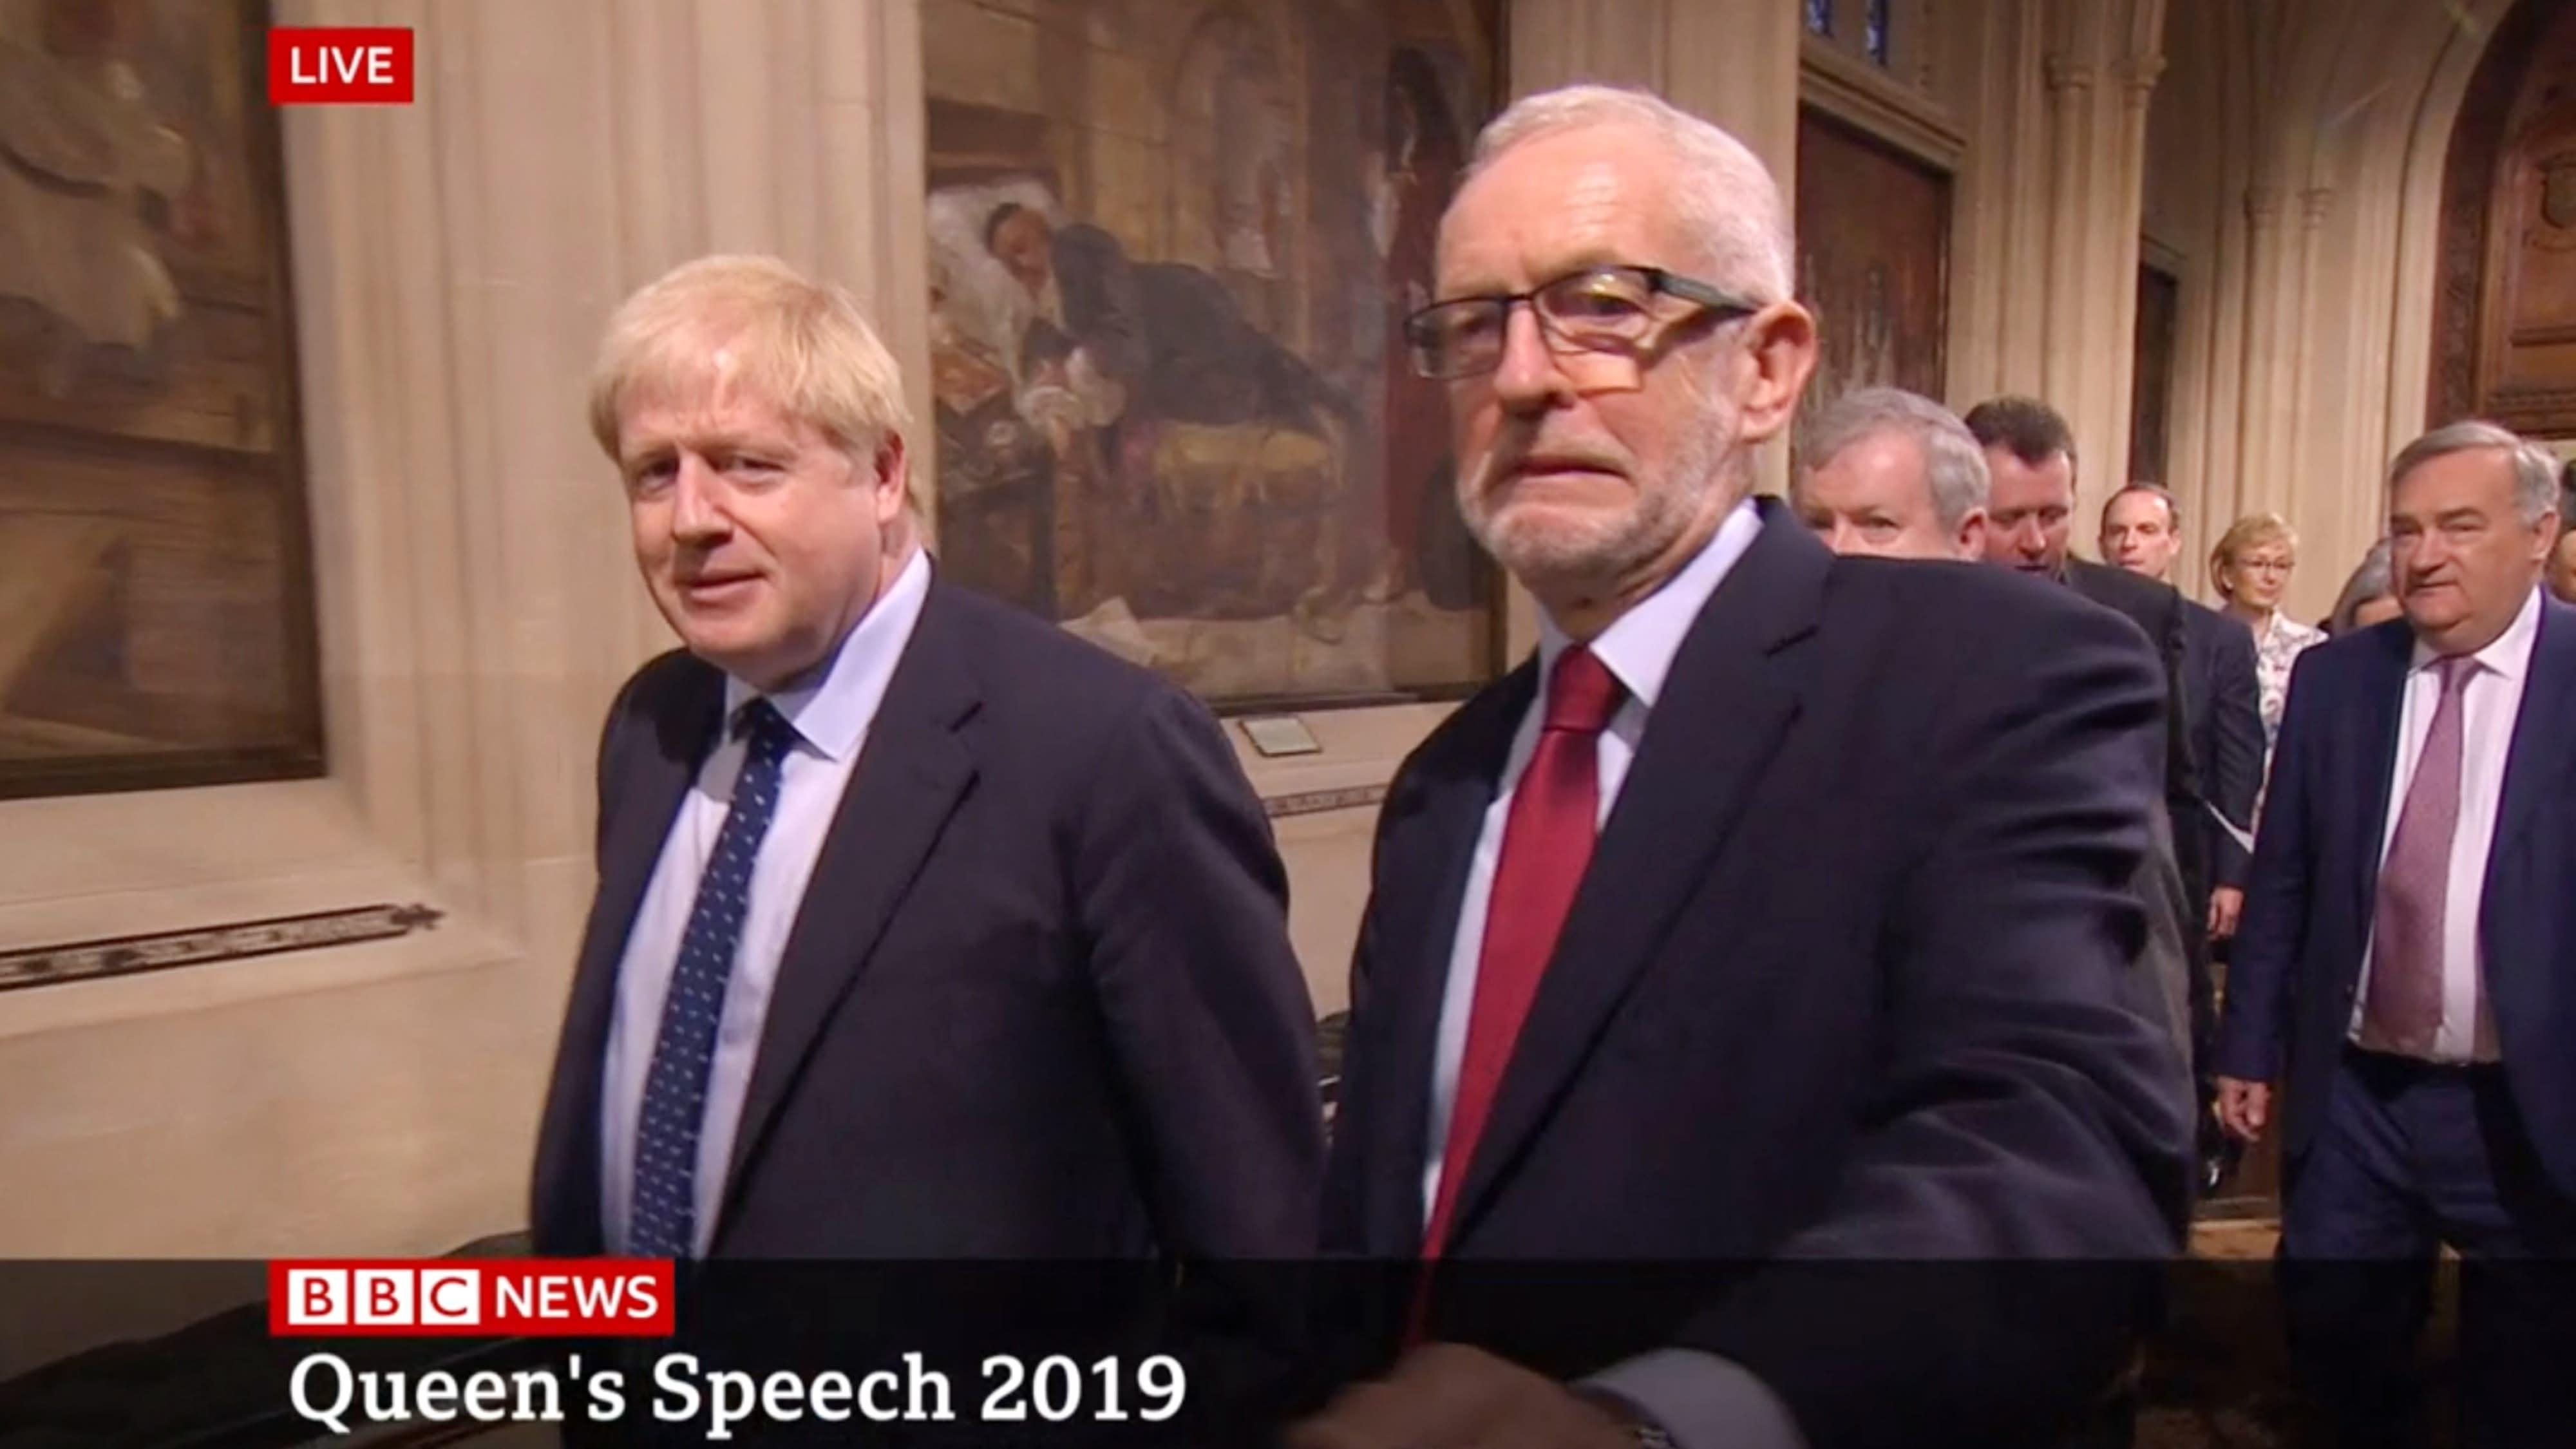 Jeremy Corbyn grimace caught on camera ahead of Queen's Speech